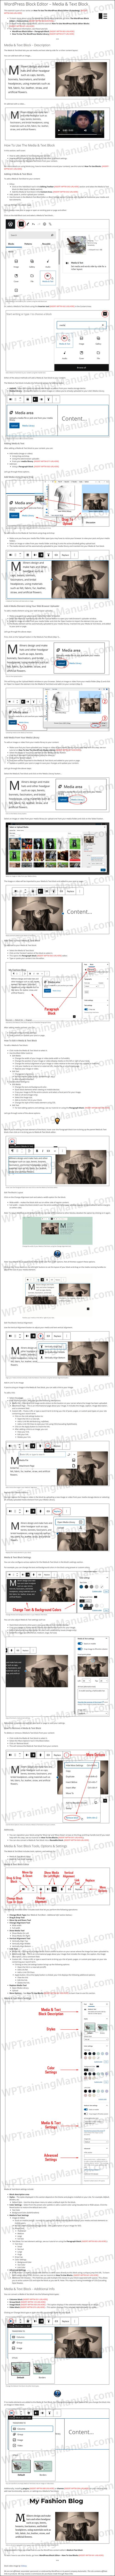 White Label Tutorial: WordPress Block Editor - Media & Text Block - WPTrainingManual.com